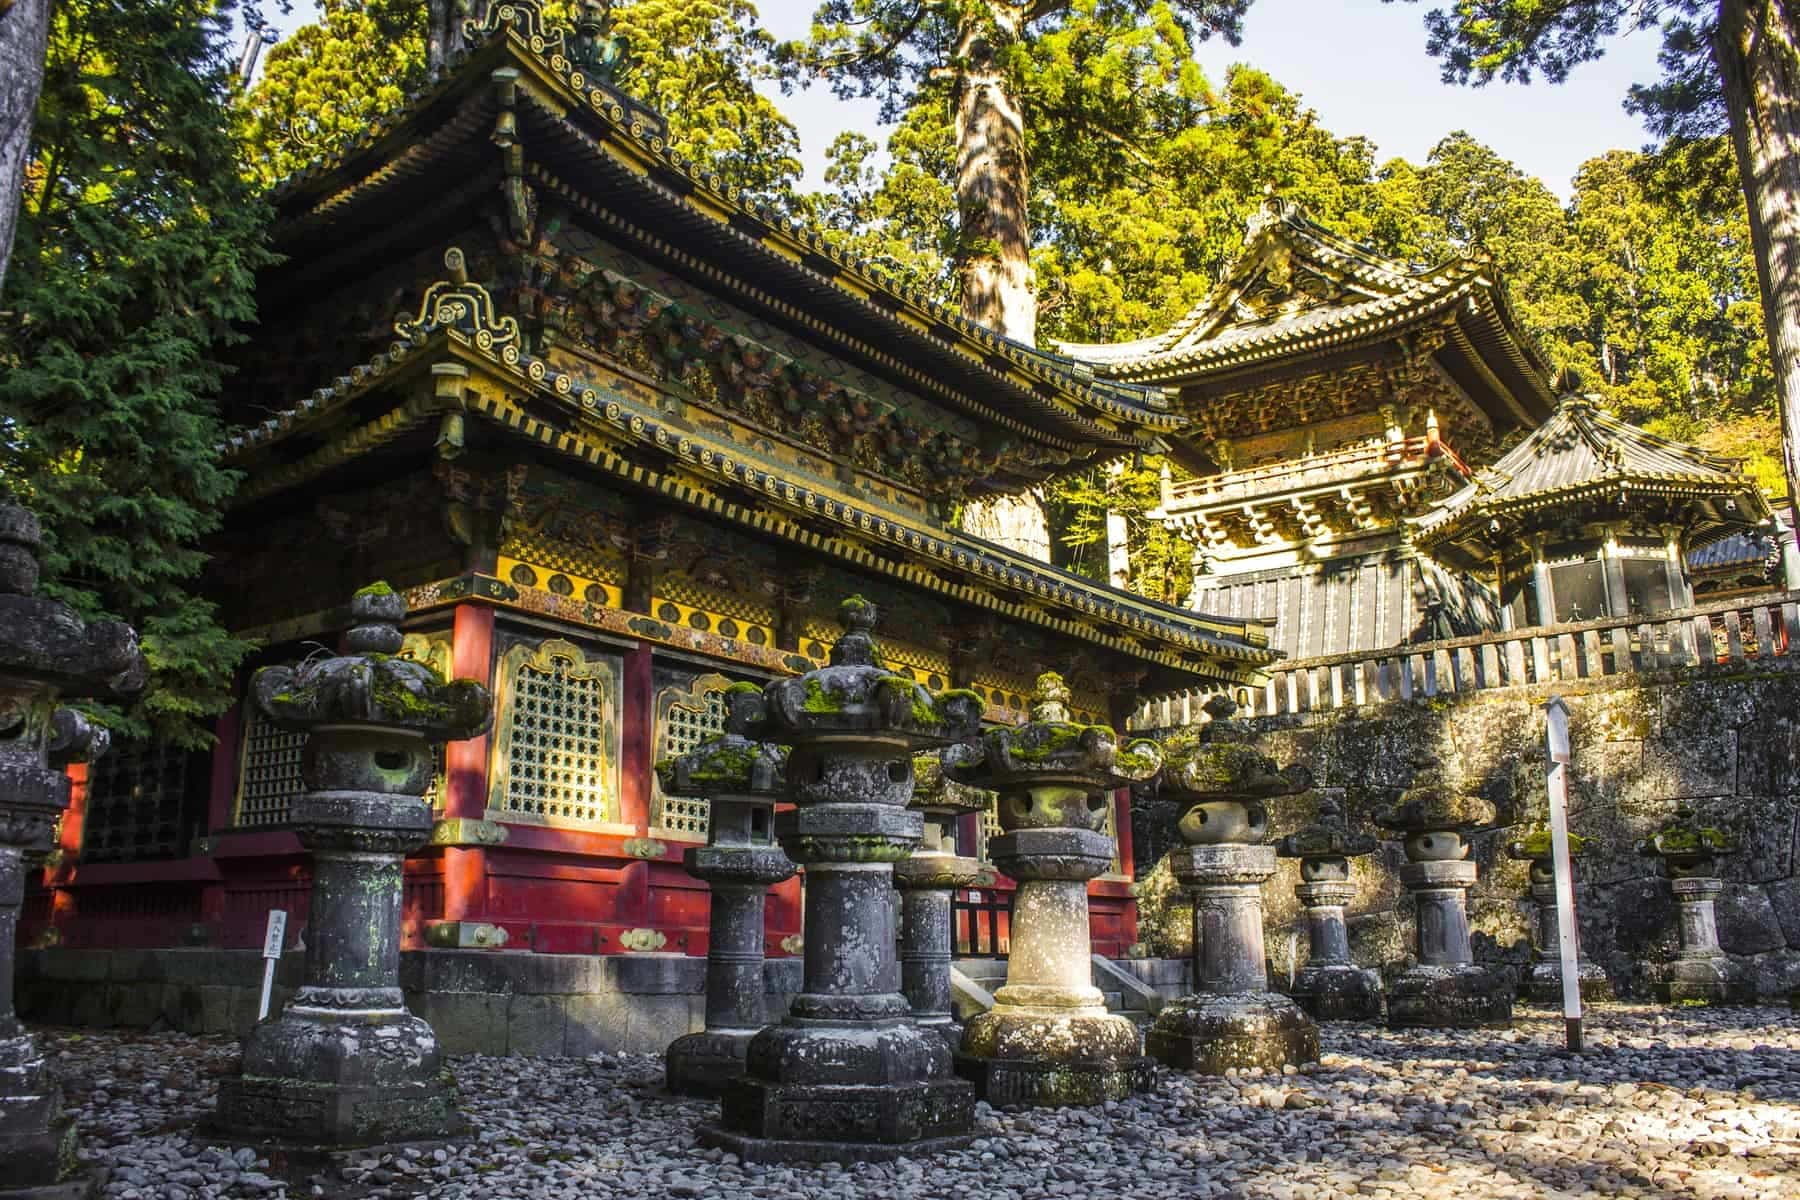 Tosho-gu, a Shinto shrine dedicated to Tokugawa Ieyasu, the founder of the Tokugawa shogunate, located in Nikko, Japan. A World Heritage Site since 1999